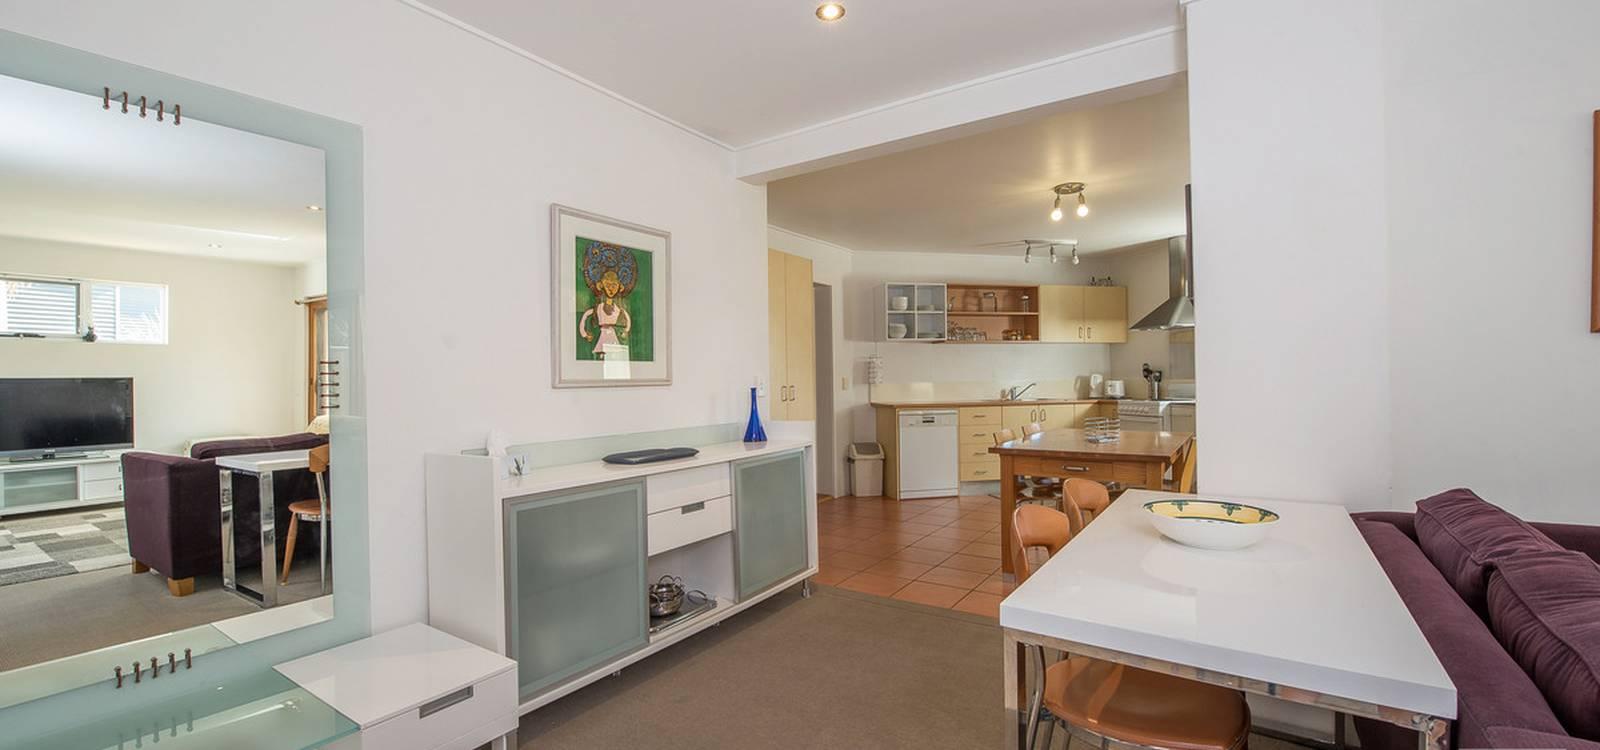 2/4 Beloka Close JINDABYNE, NSW 2627 - photo 1